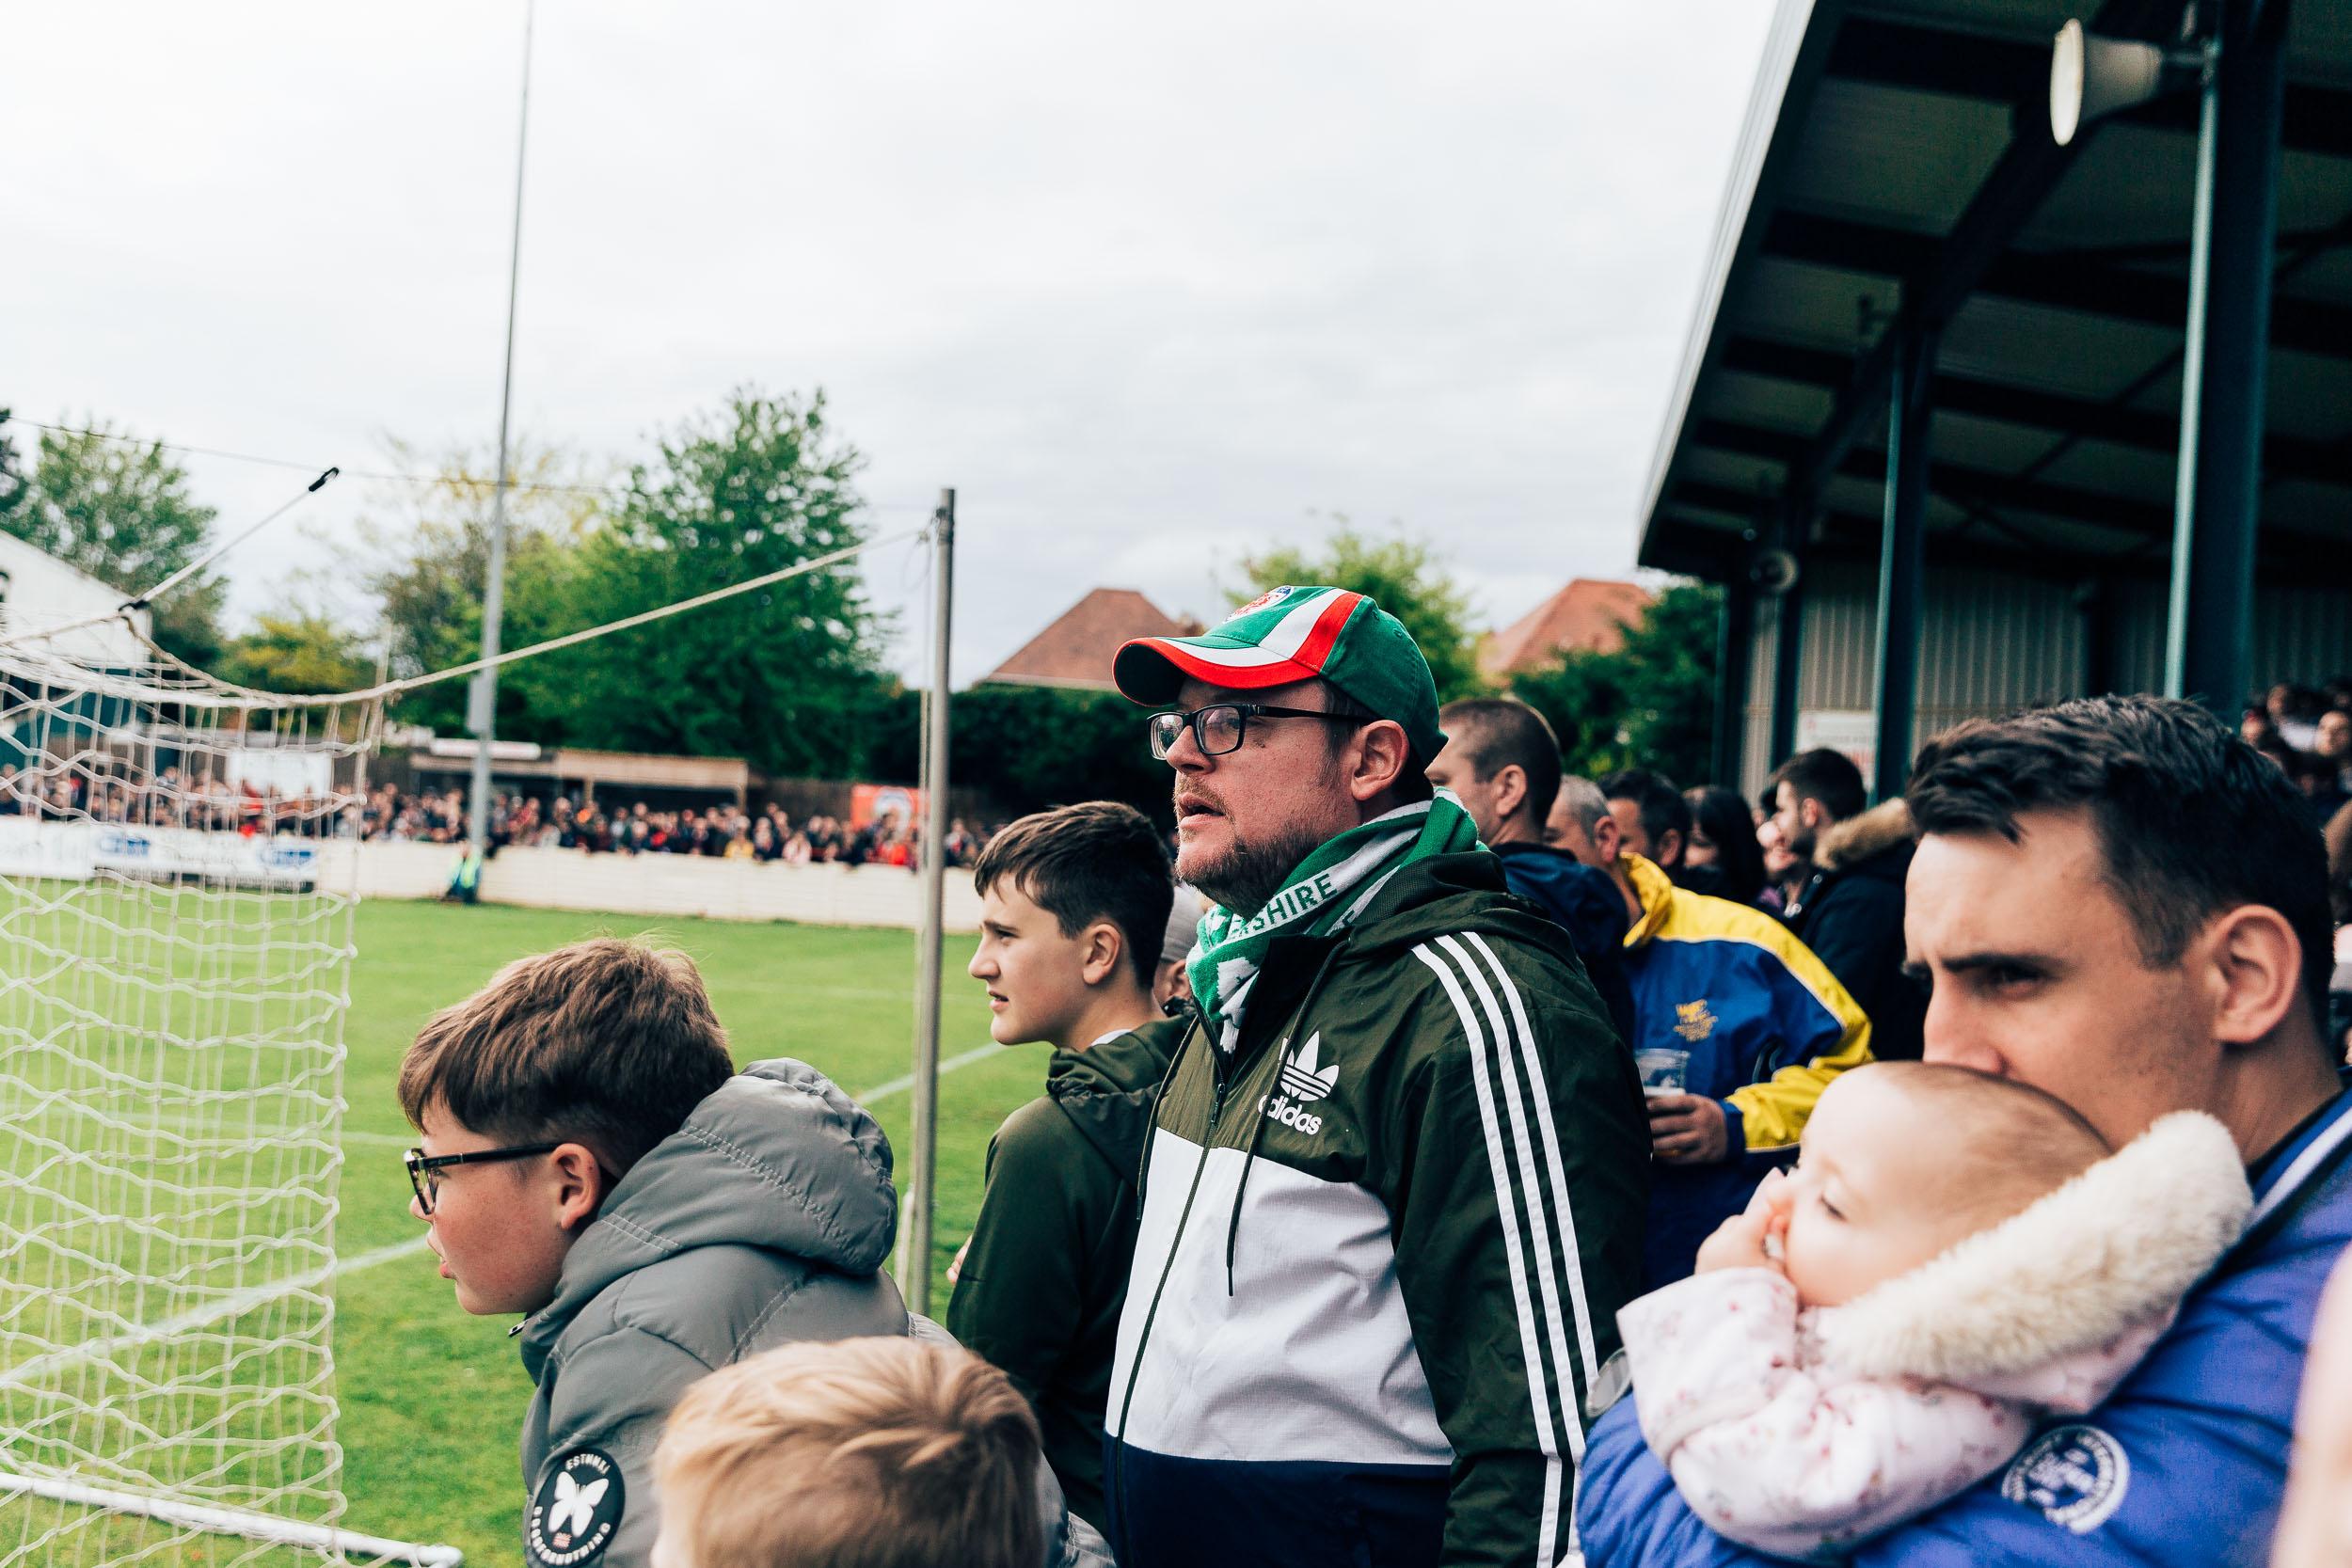 06_05_2019_Bromsgrove_Sporting_Corby-75.jpg